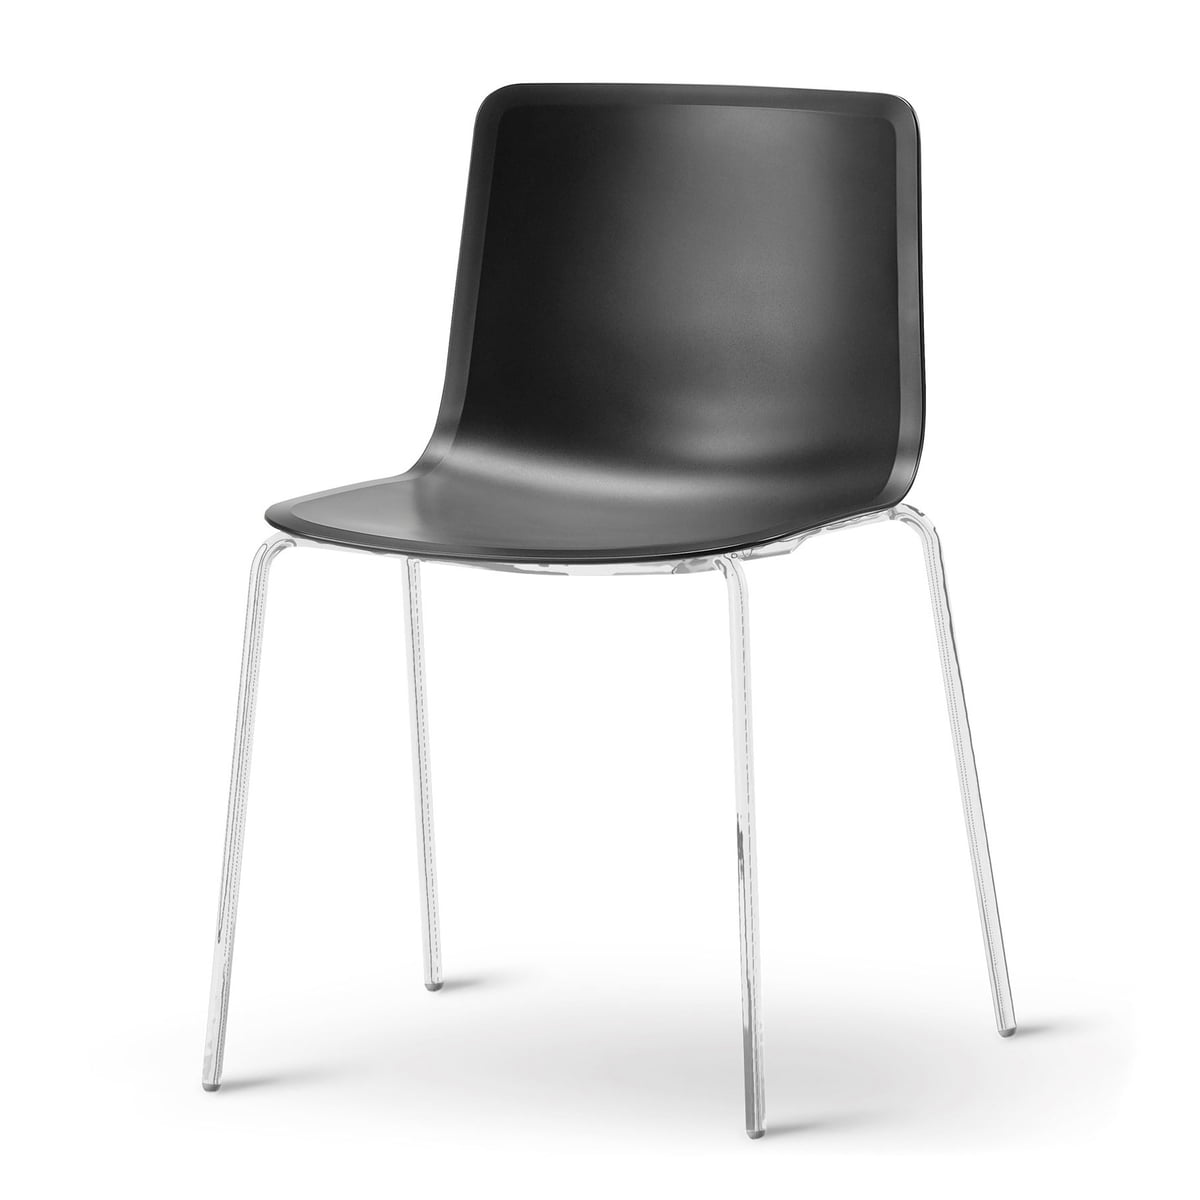 Chaise pato fredericia connox for Quatre pieds quatre chaises